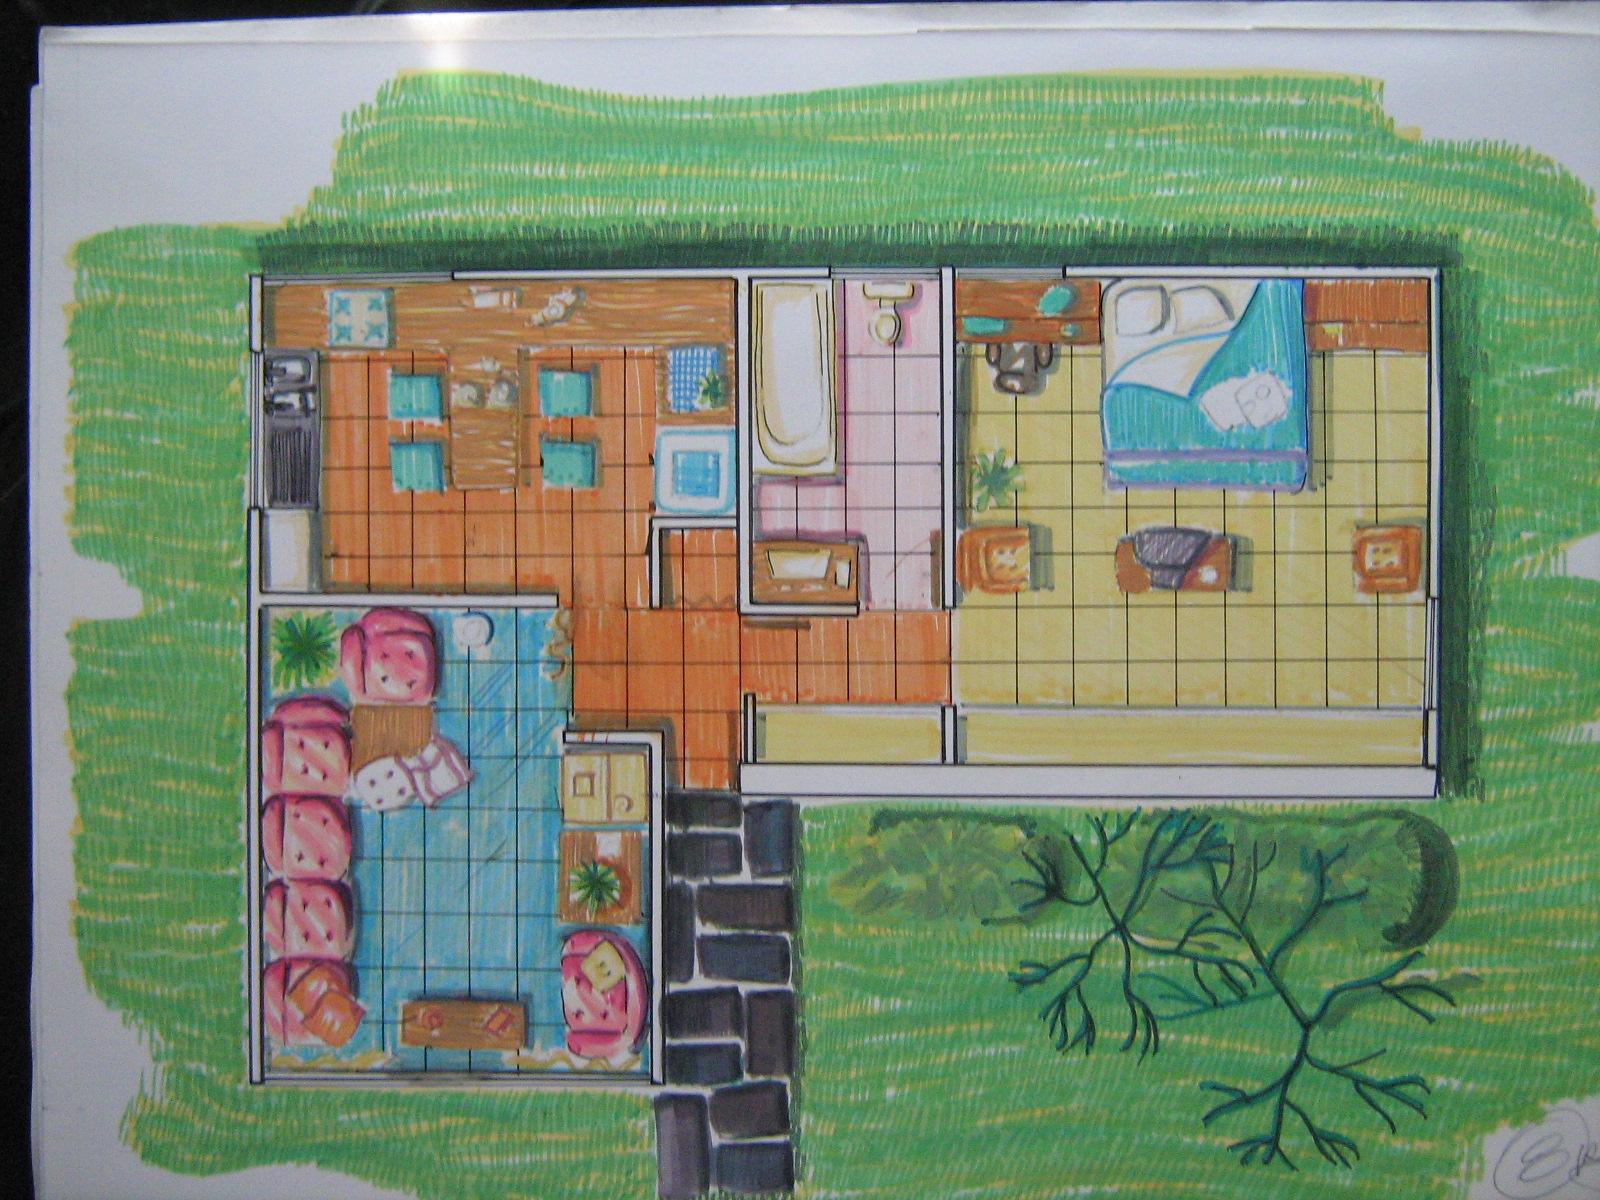 Mi portafolio de arquitectura usac plantas arquitect nicas for Plantas arquitectonicas de casas